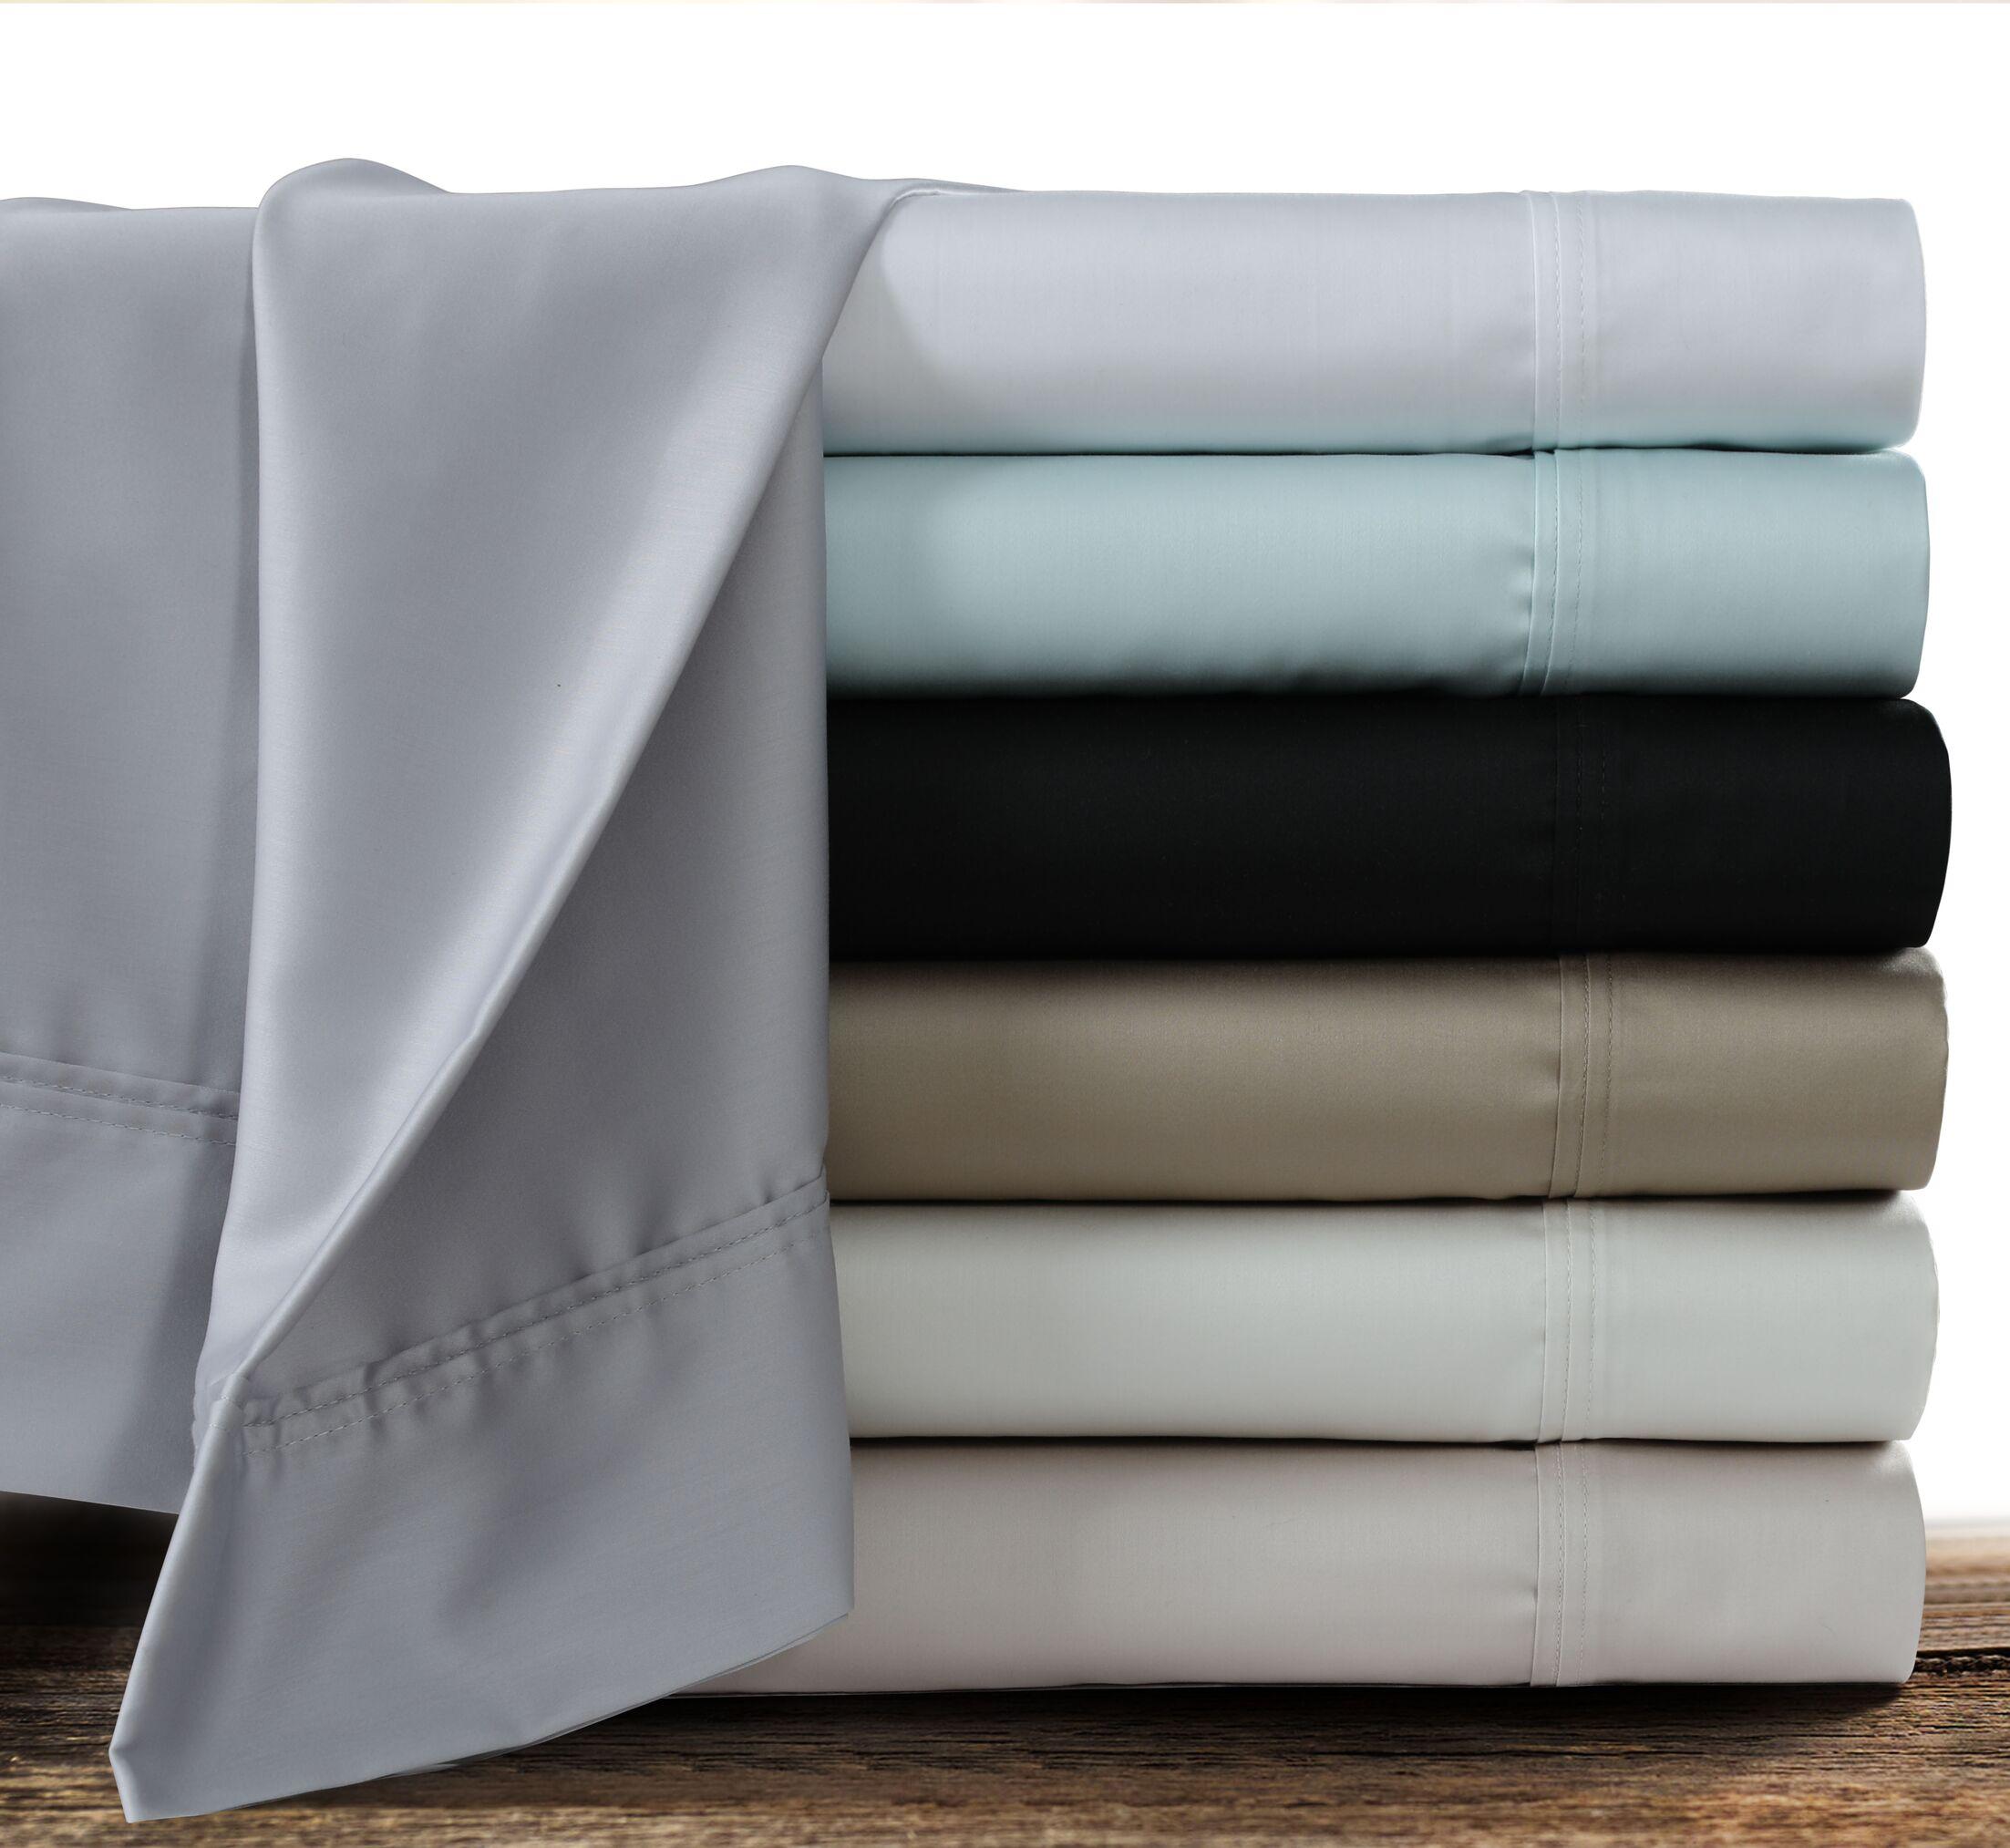 Myrtledale 360 Thread Count 100% Cotton Sheet Set Color: Champagne, Size: King